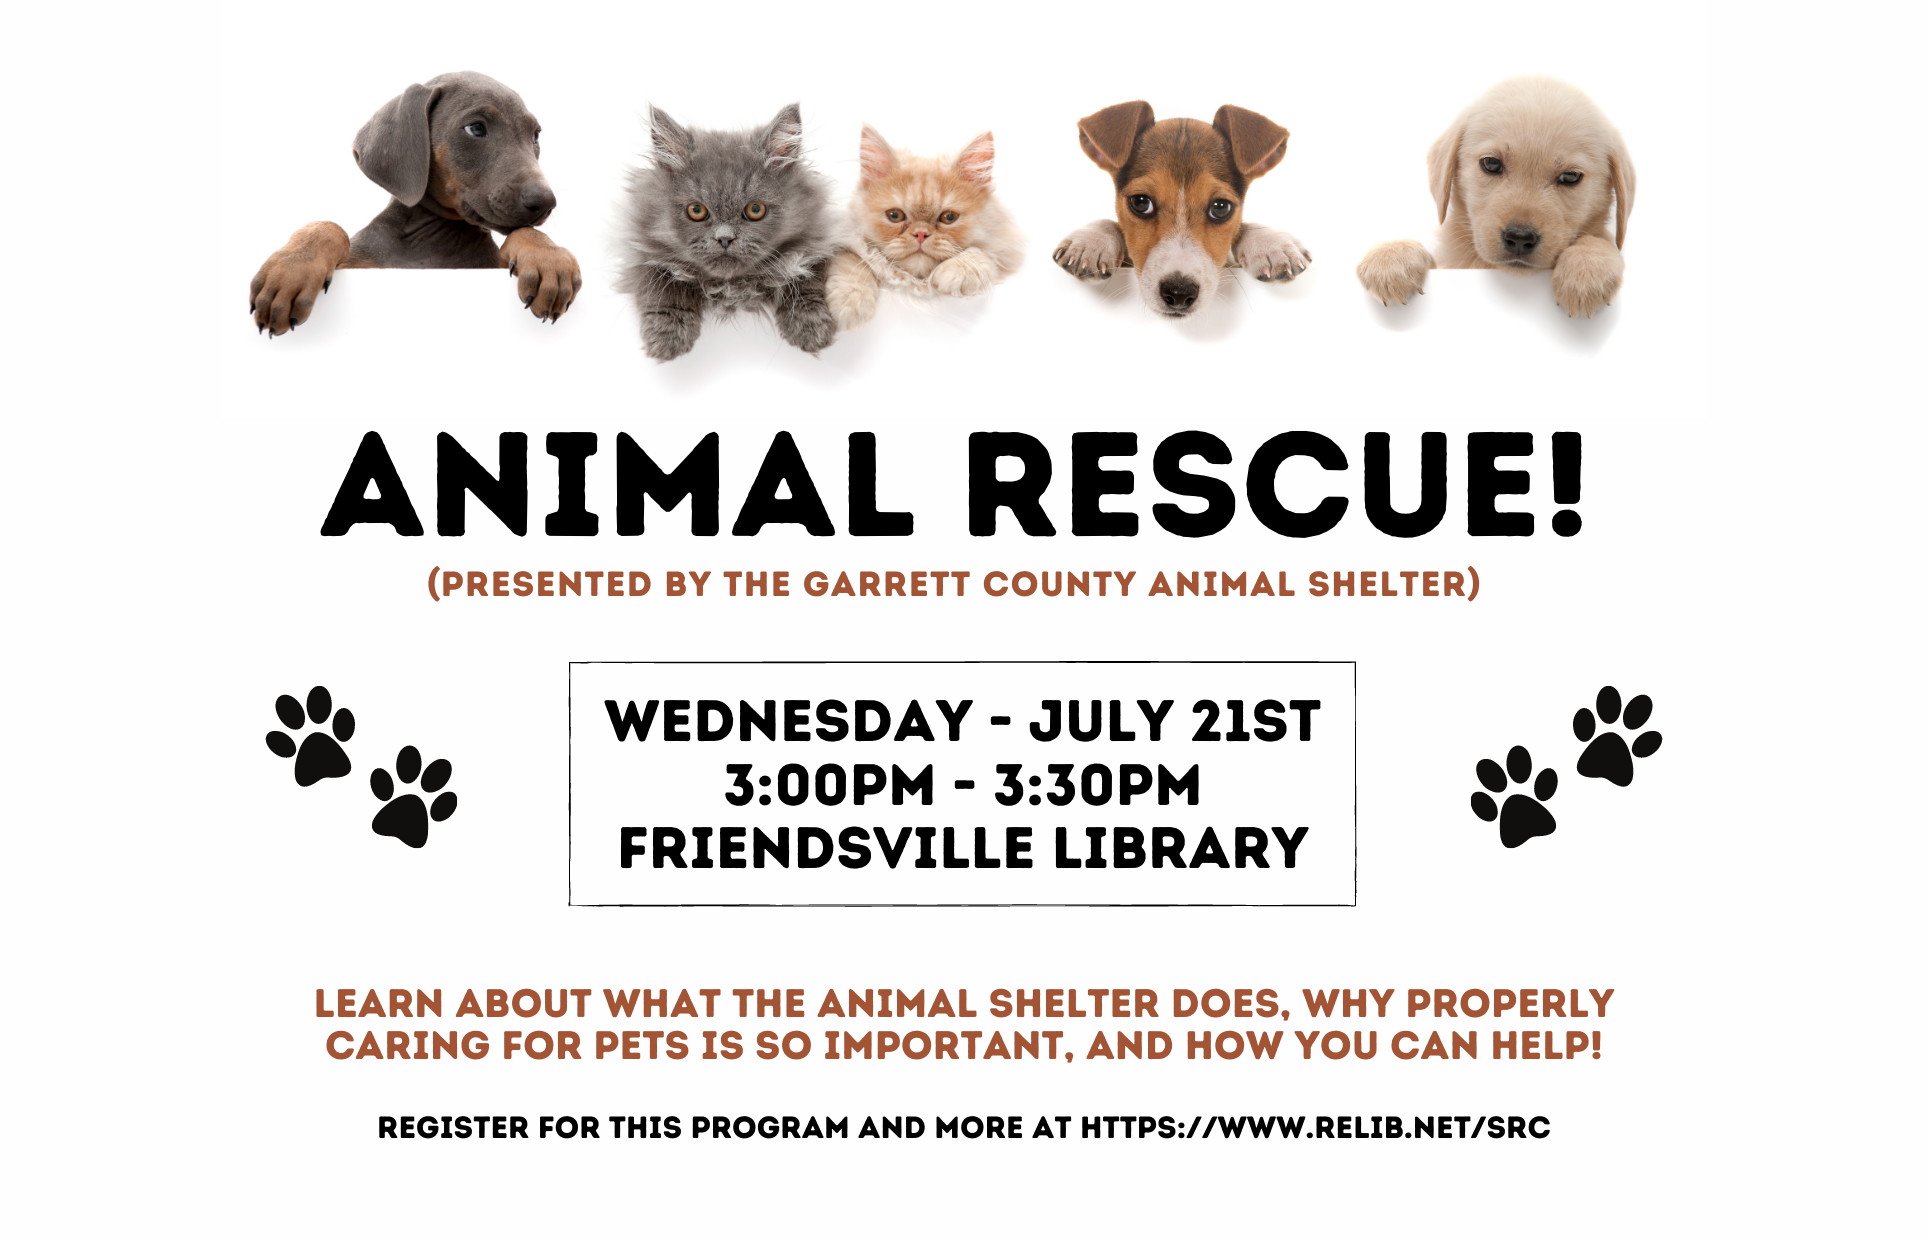 Animal Rescue! Garrett County Animal Shelter